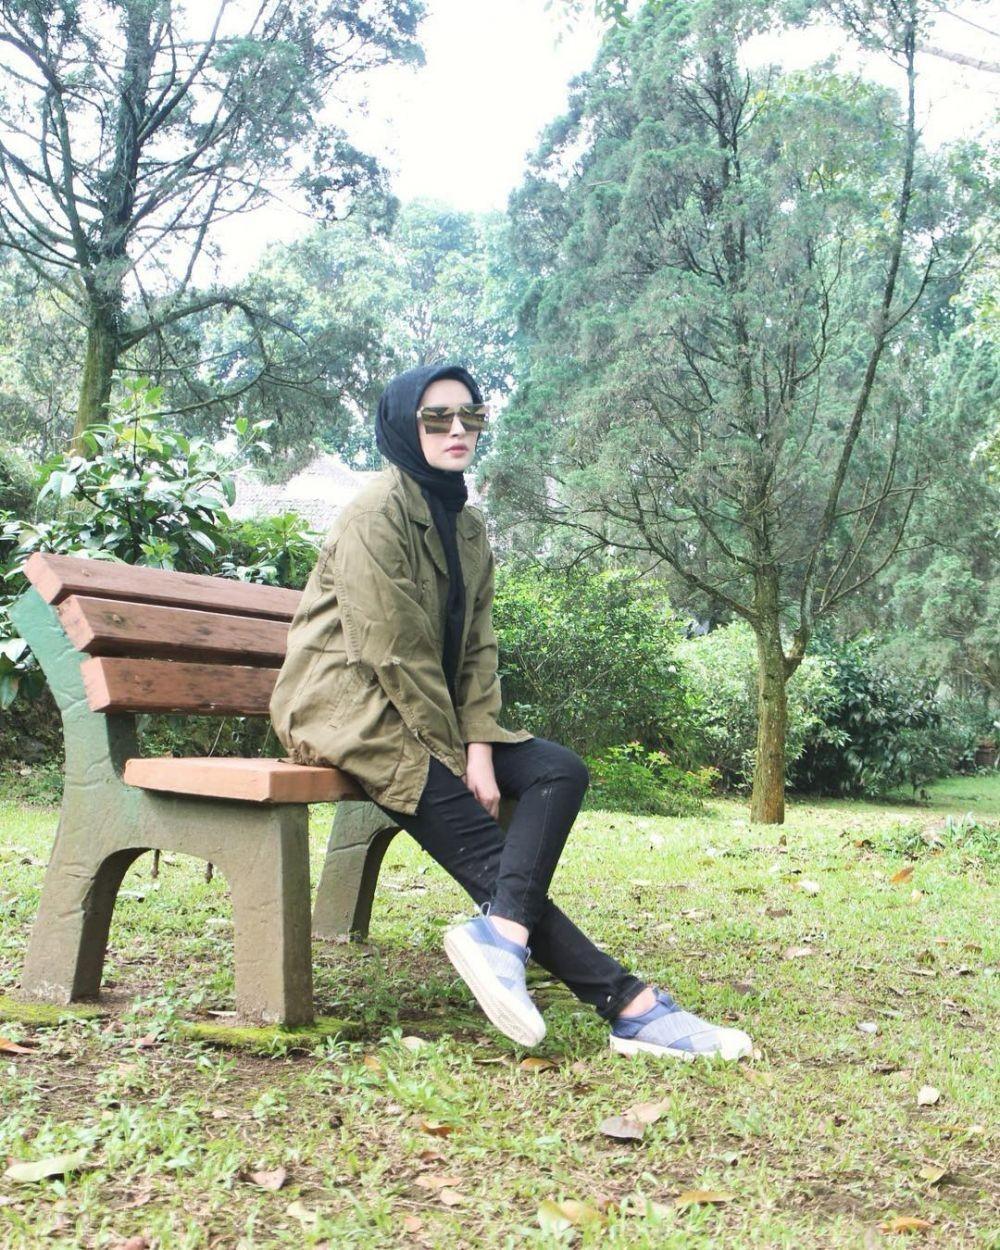 10 Potret Angel Qulbiah, Istri Richie 'Five Minutes' yang Menawan Abis